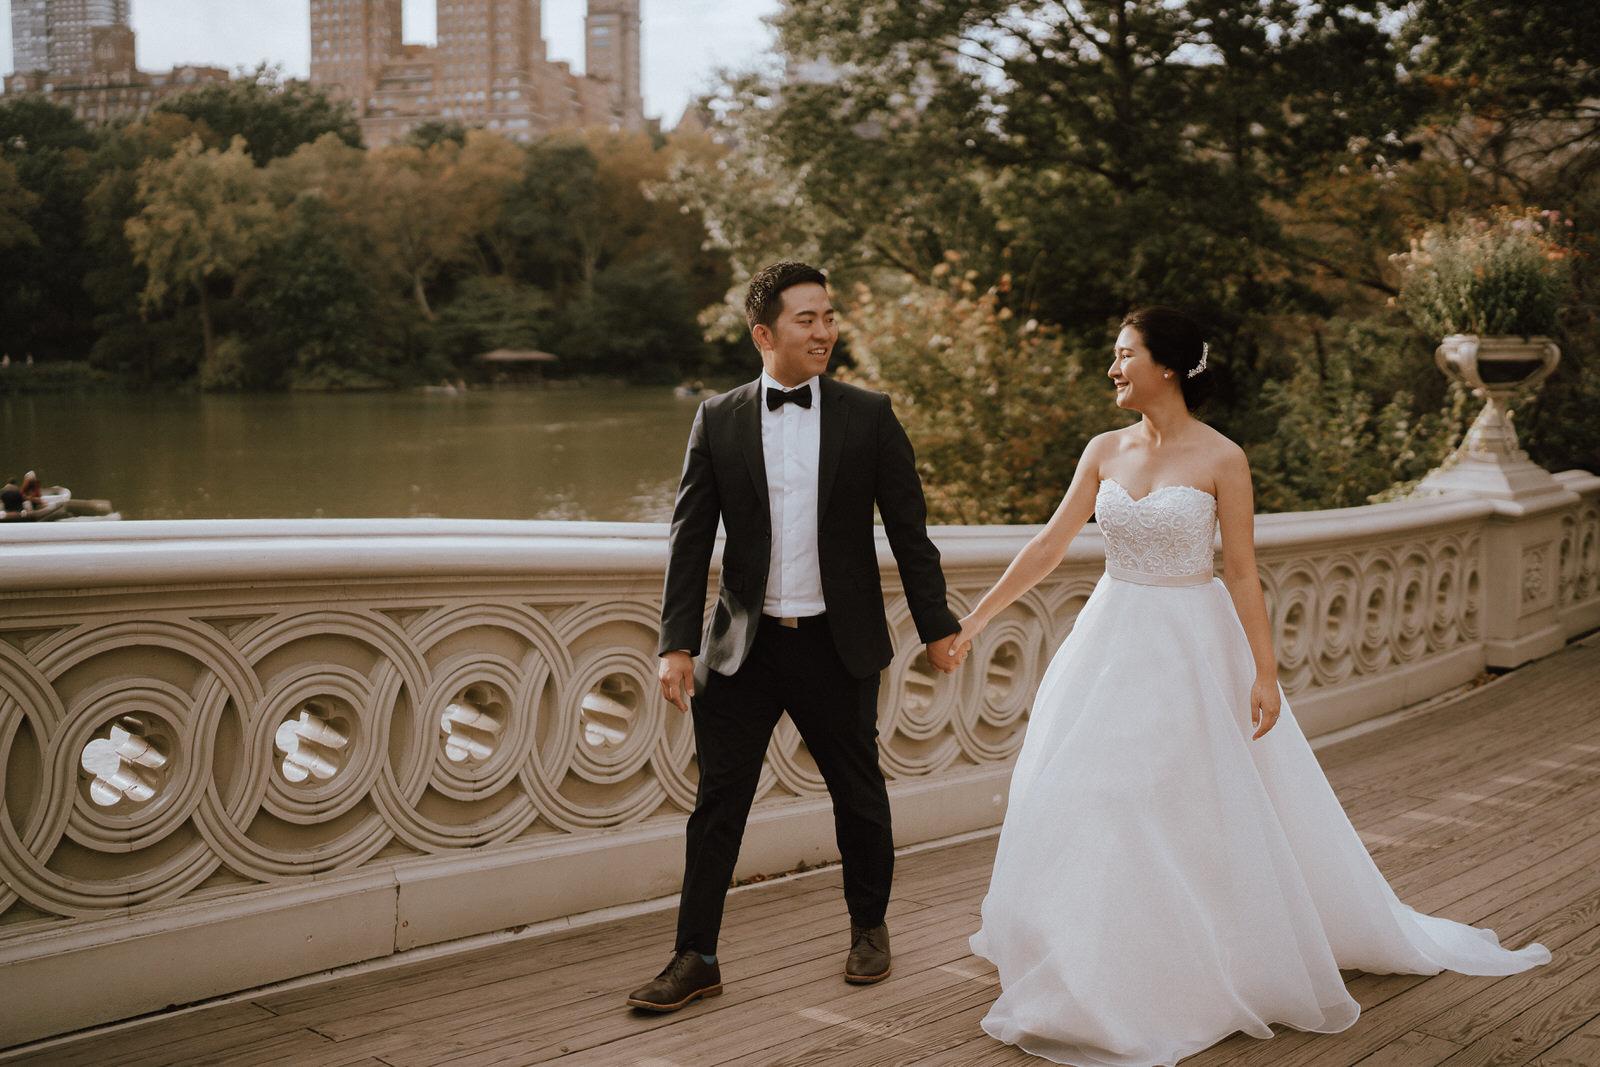 Central Park Elopement Photos-Bow Bridge-Michelle Gonzalez Photography- New York Wedding Photographer-53.jpg